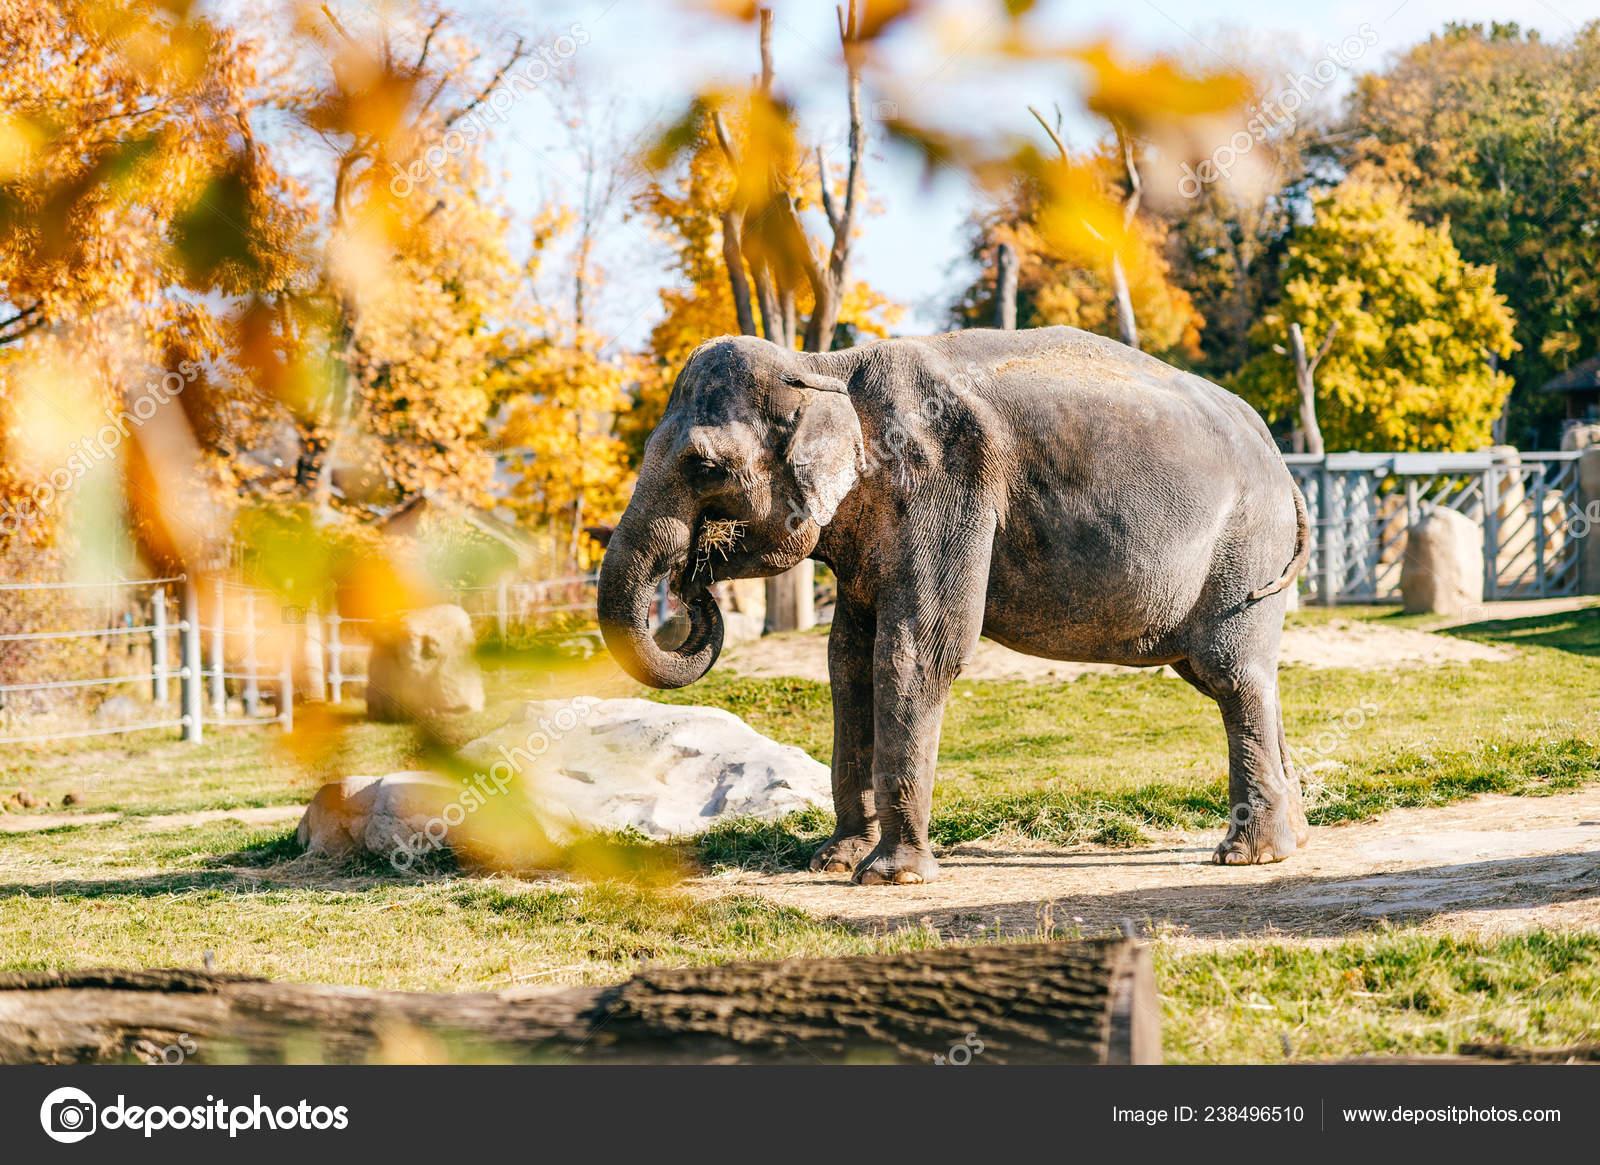 Elephant Natural Habitat Africain Autumn Southern Safari Park Stock Photo C Hplovecraft Mail Ru 238496510